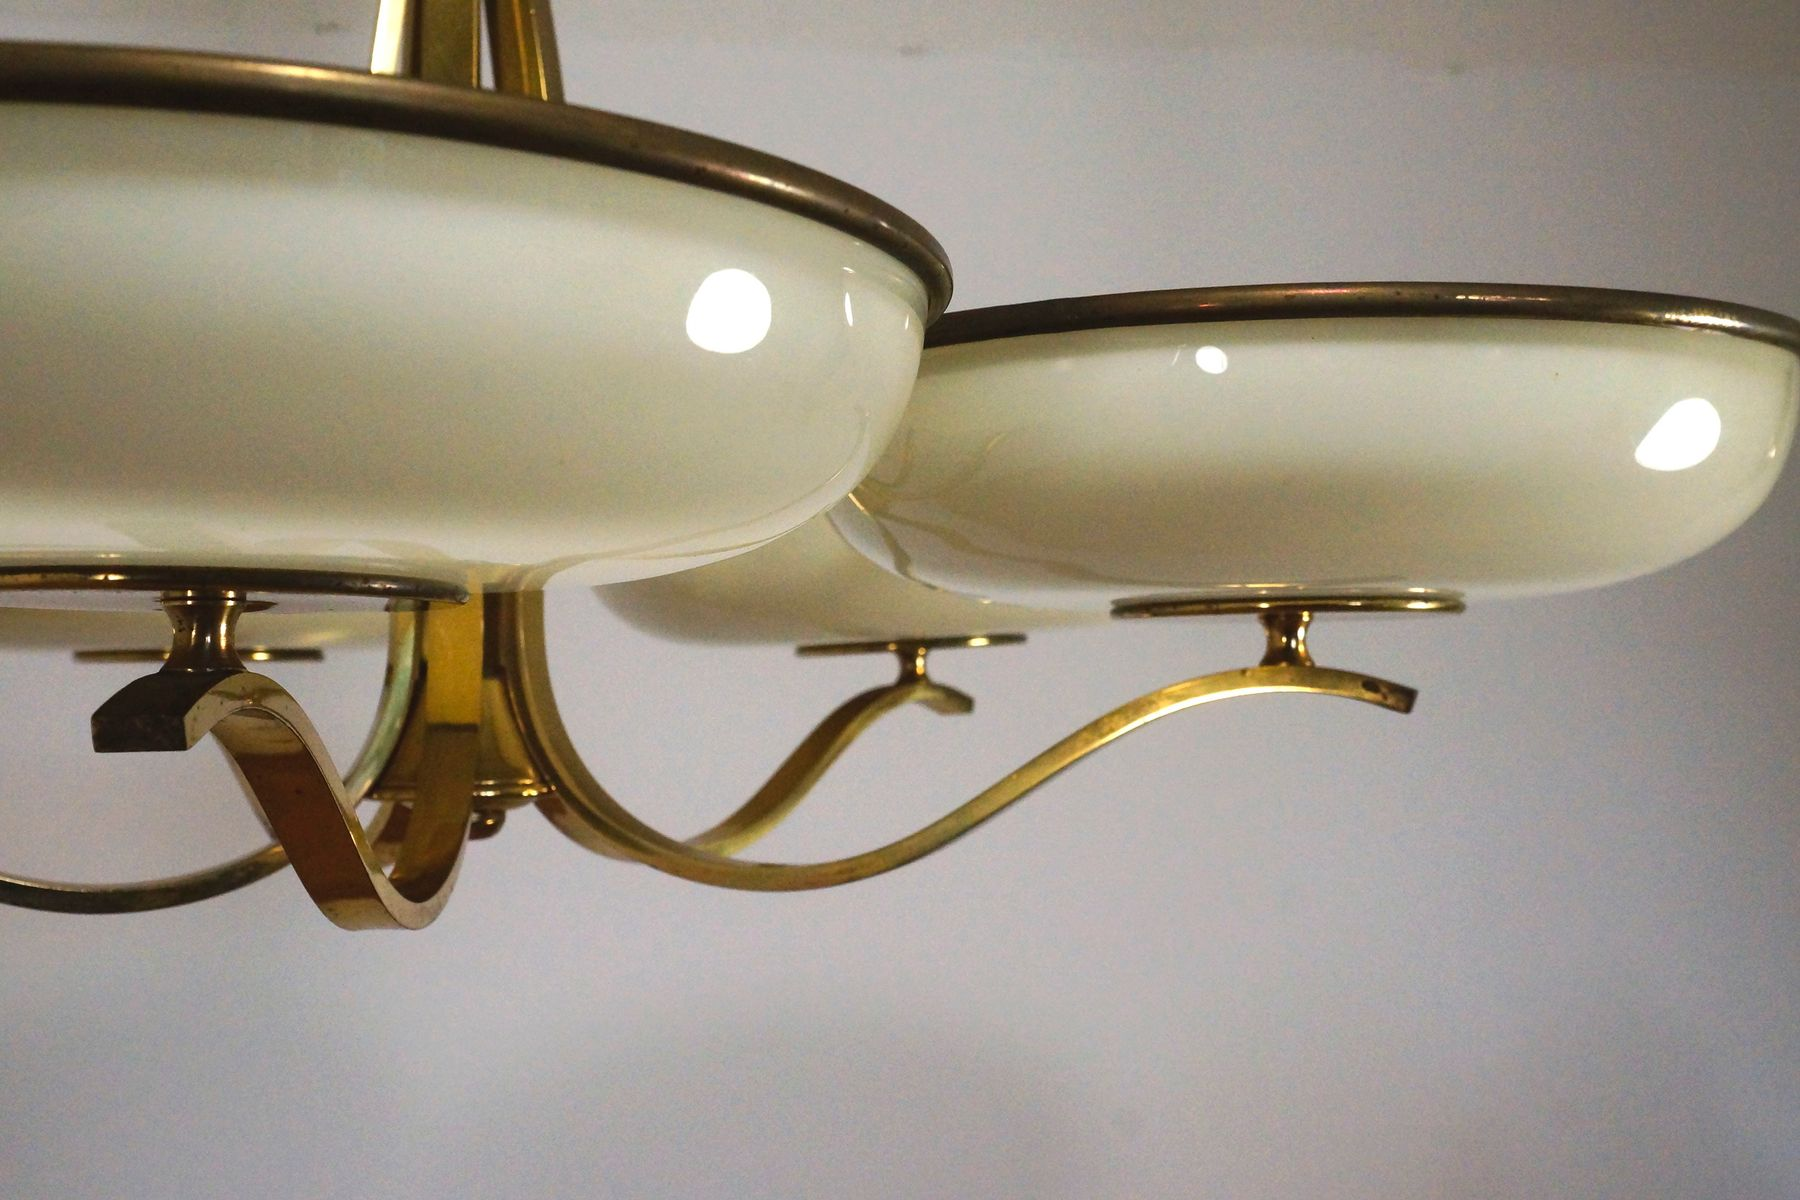 h ngelampe aus glas messing 1940er bei pamono kaufen. Black Bedroom Furniture Sets. Home Design Ideas